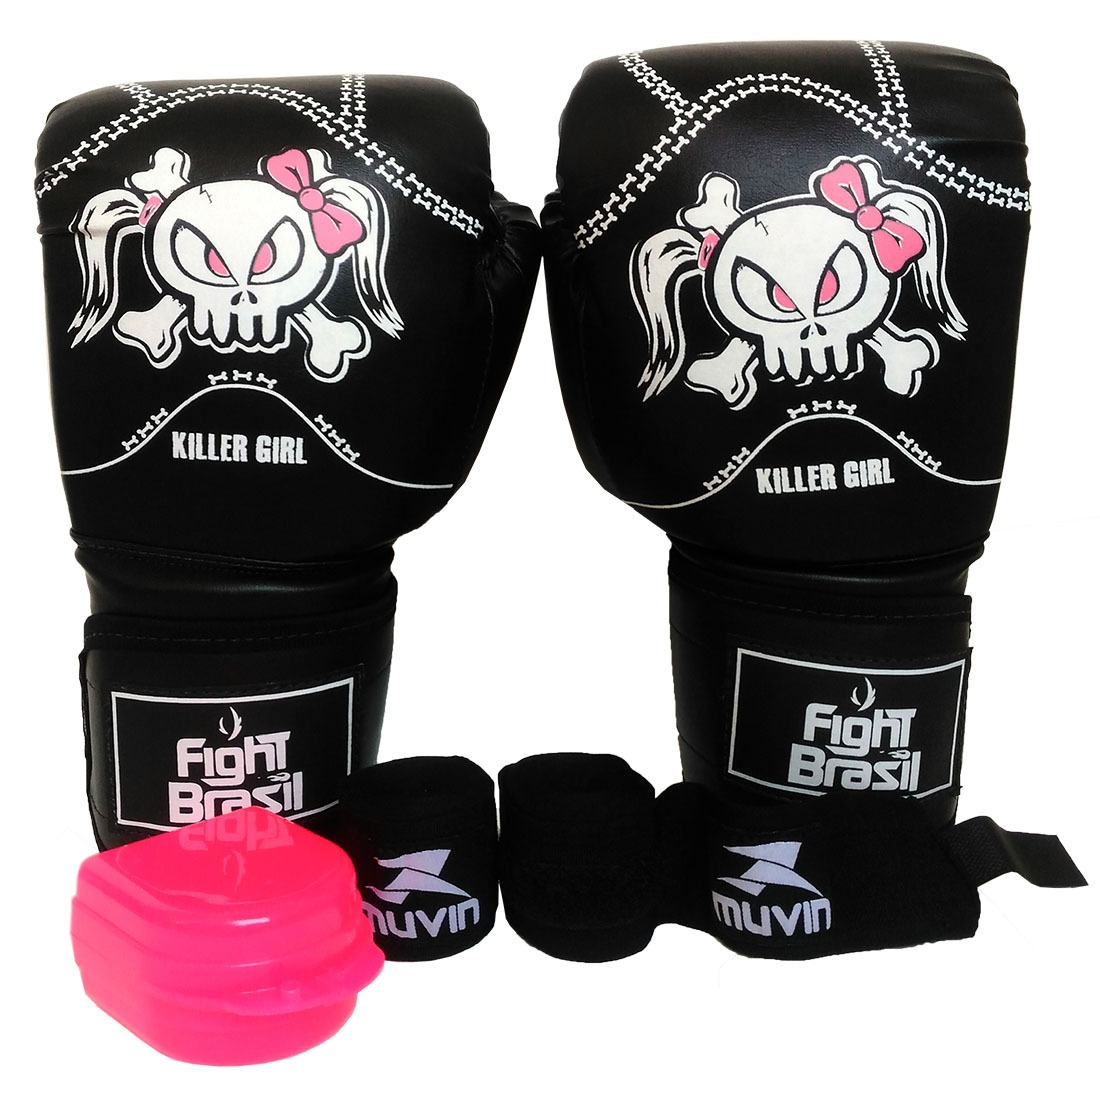 c6d8e36a4 kit muay thai boxe luva + bandagem + protetor bucal feminino. Carregando  zoom.